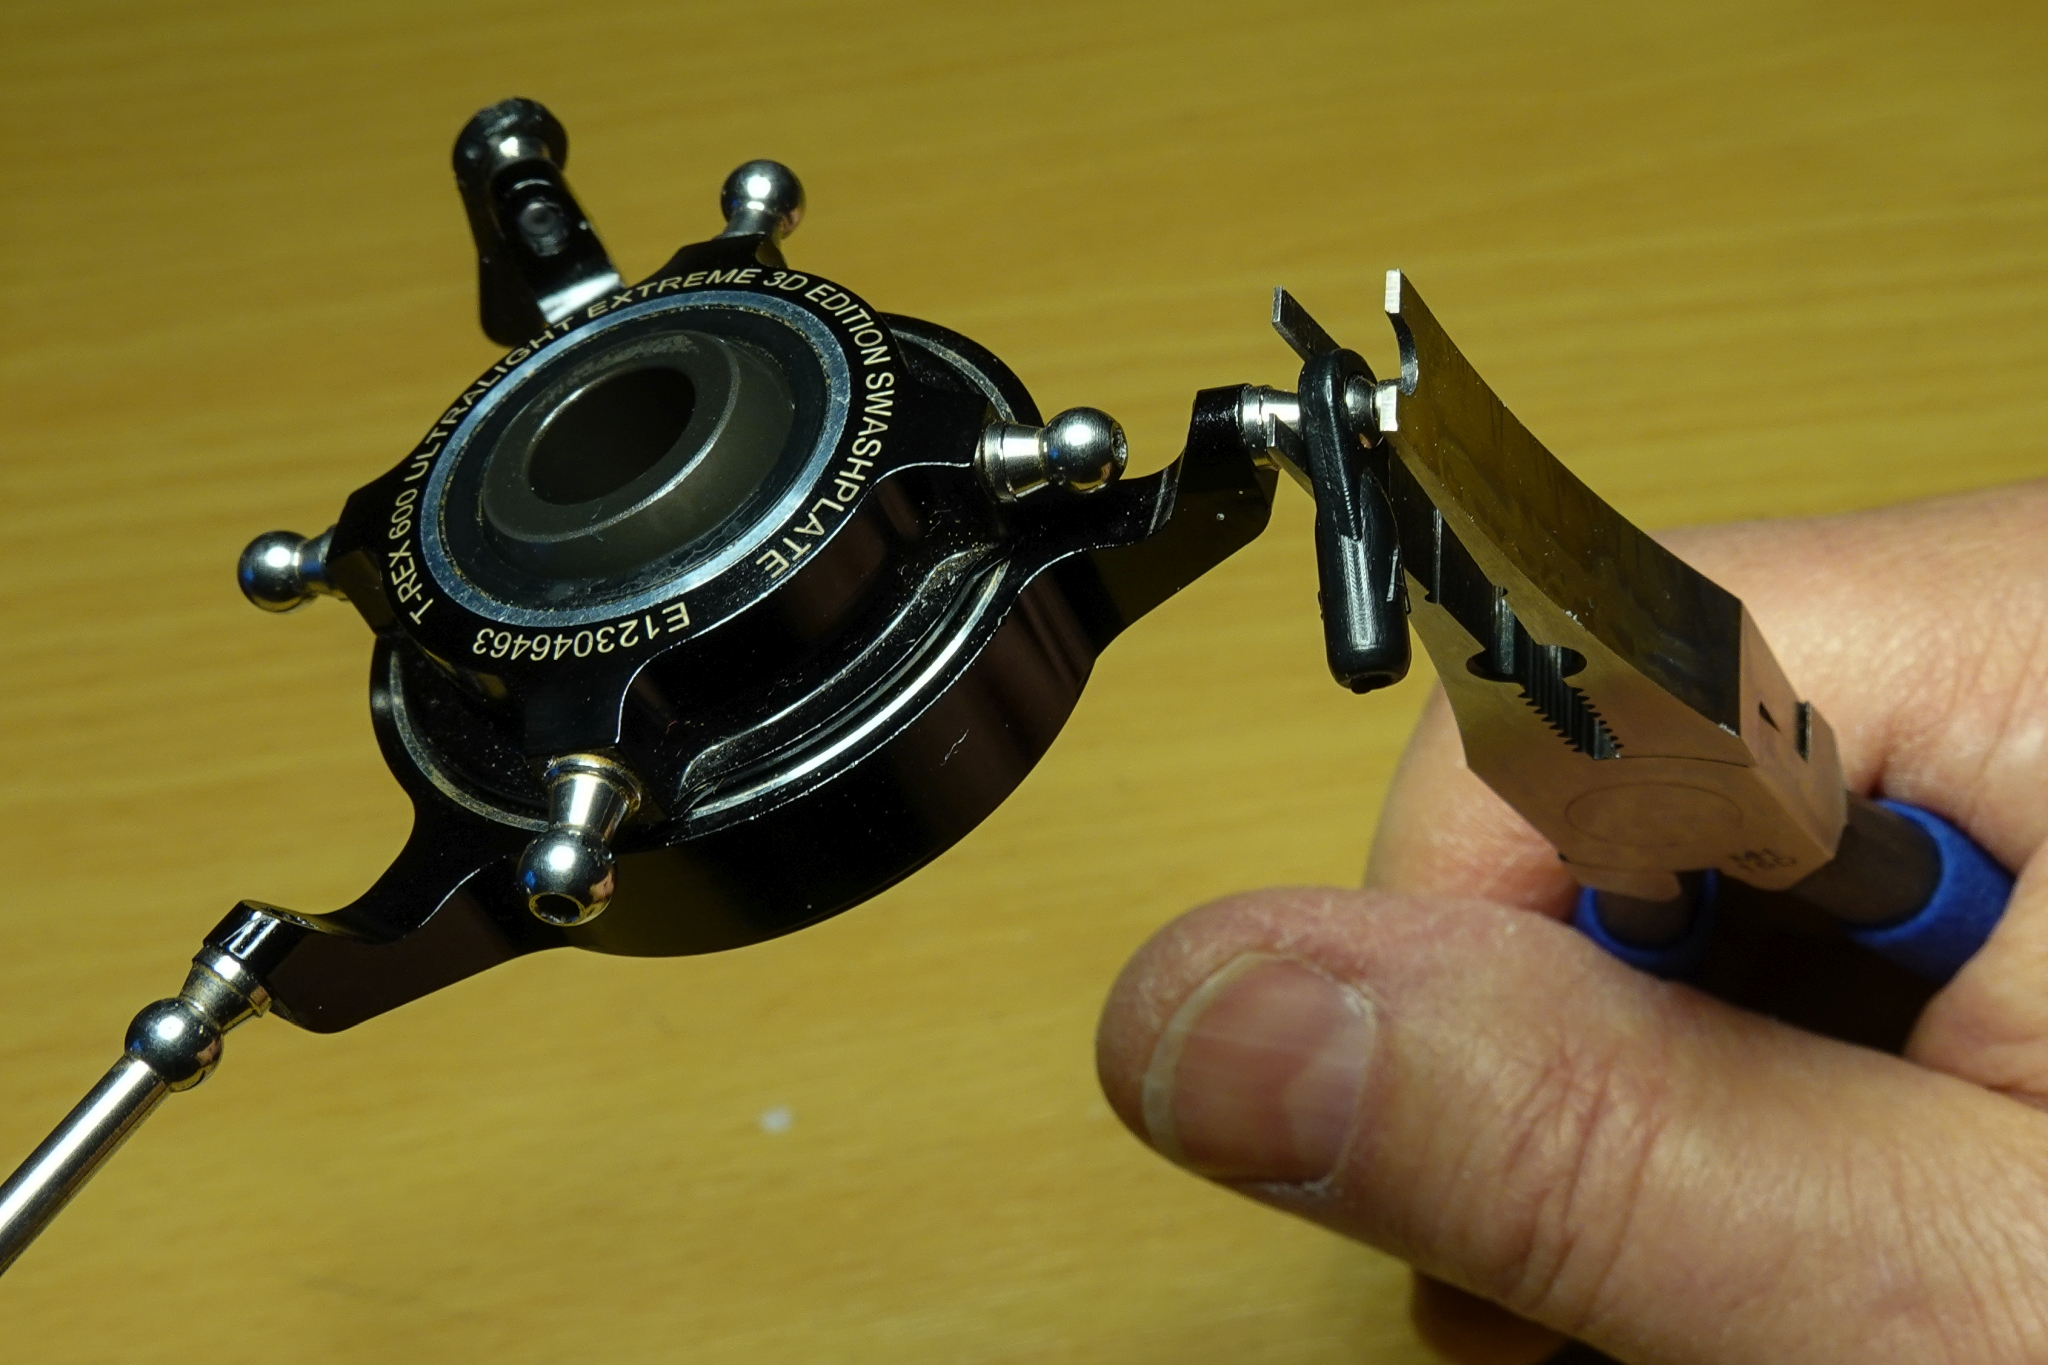 Kugelkopfzange angesetzt zum Entfernen des Kugelgelenks